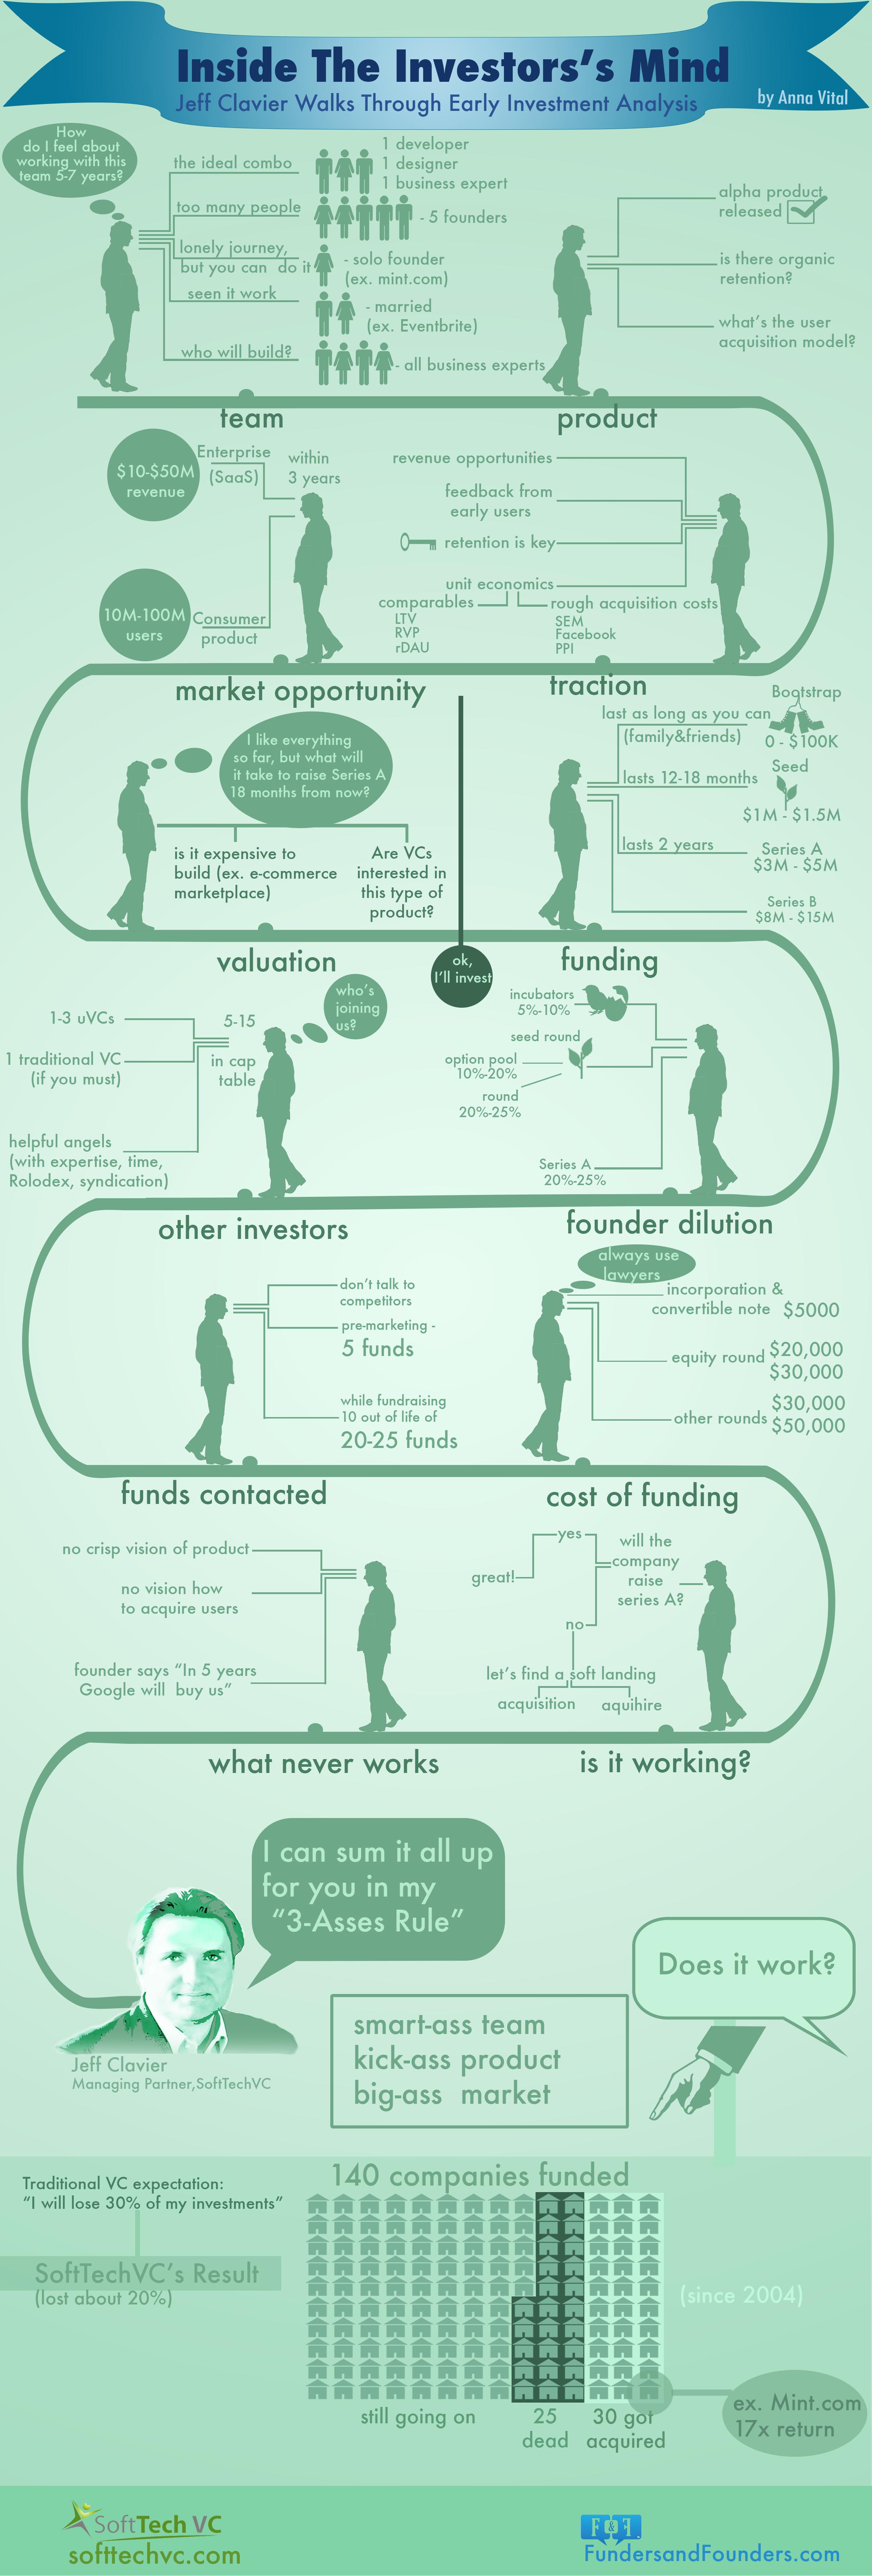 inside-the-investors-mind_50f739ff5f847